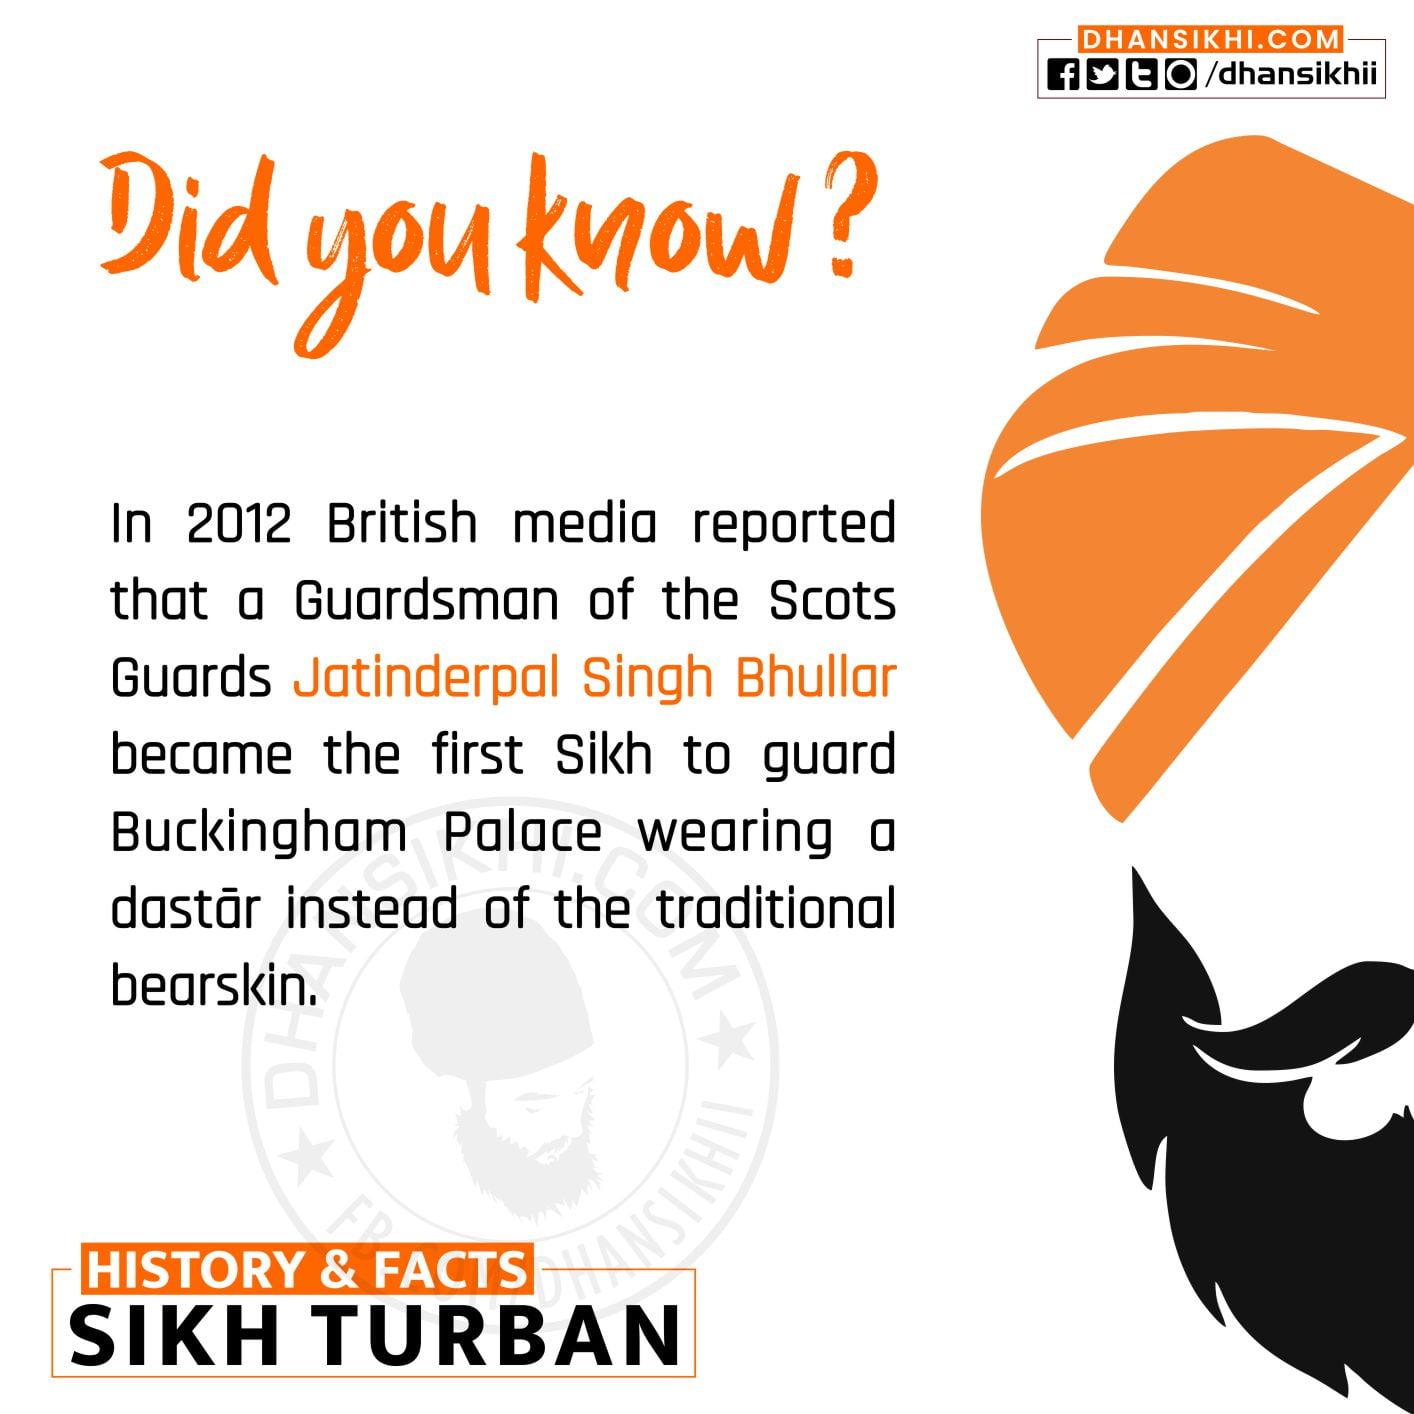 Sikh Turban History & Facts Insta Post Whatsapp Status